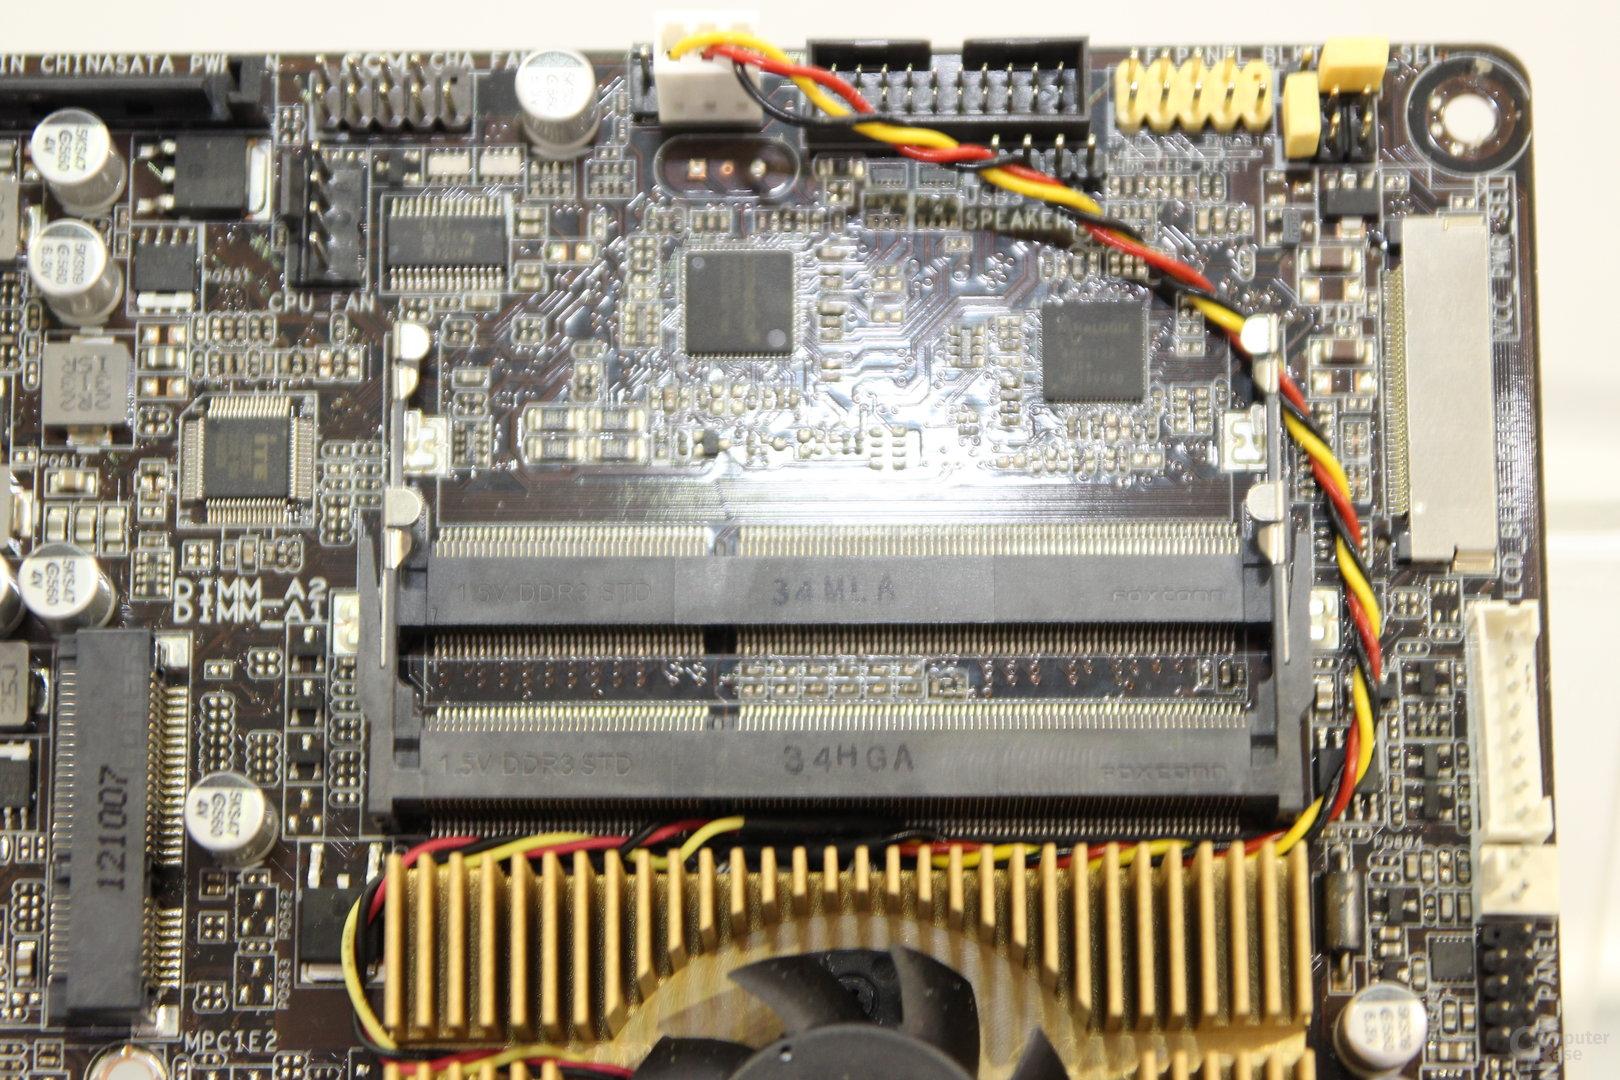 Asus XS-A mit AMD A4-5000 (Kabini)